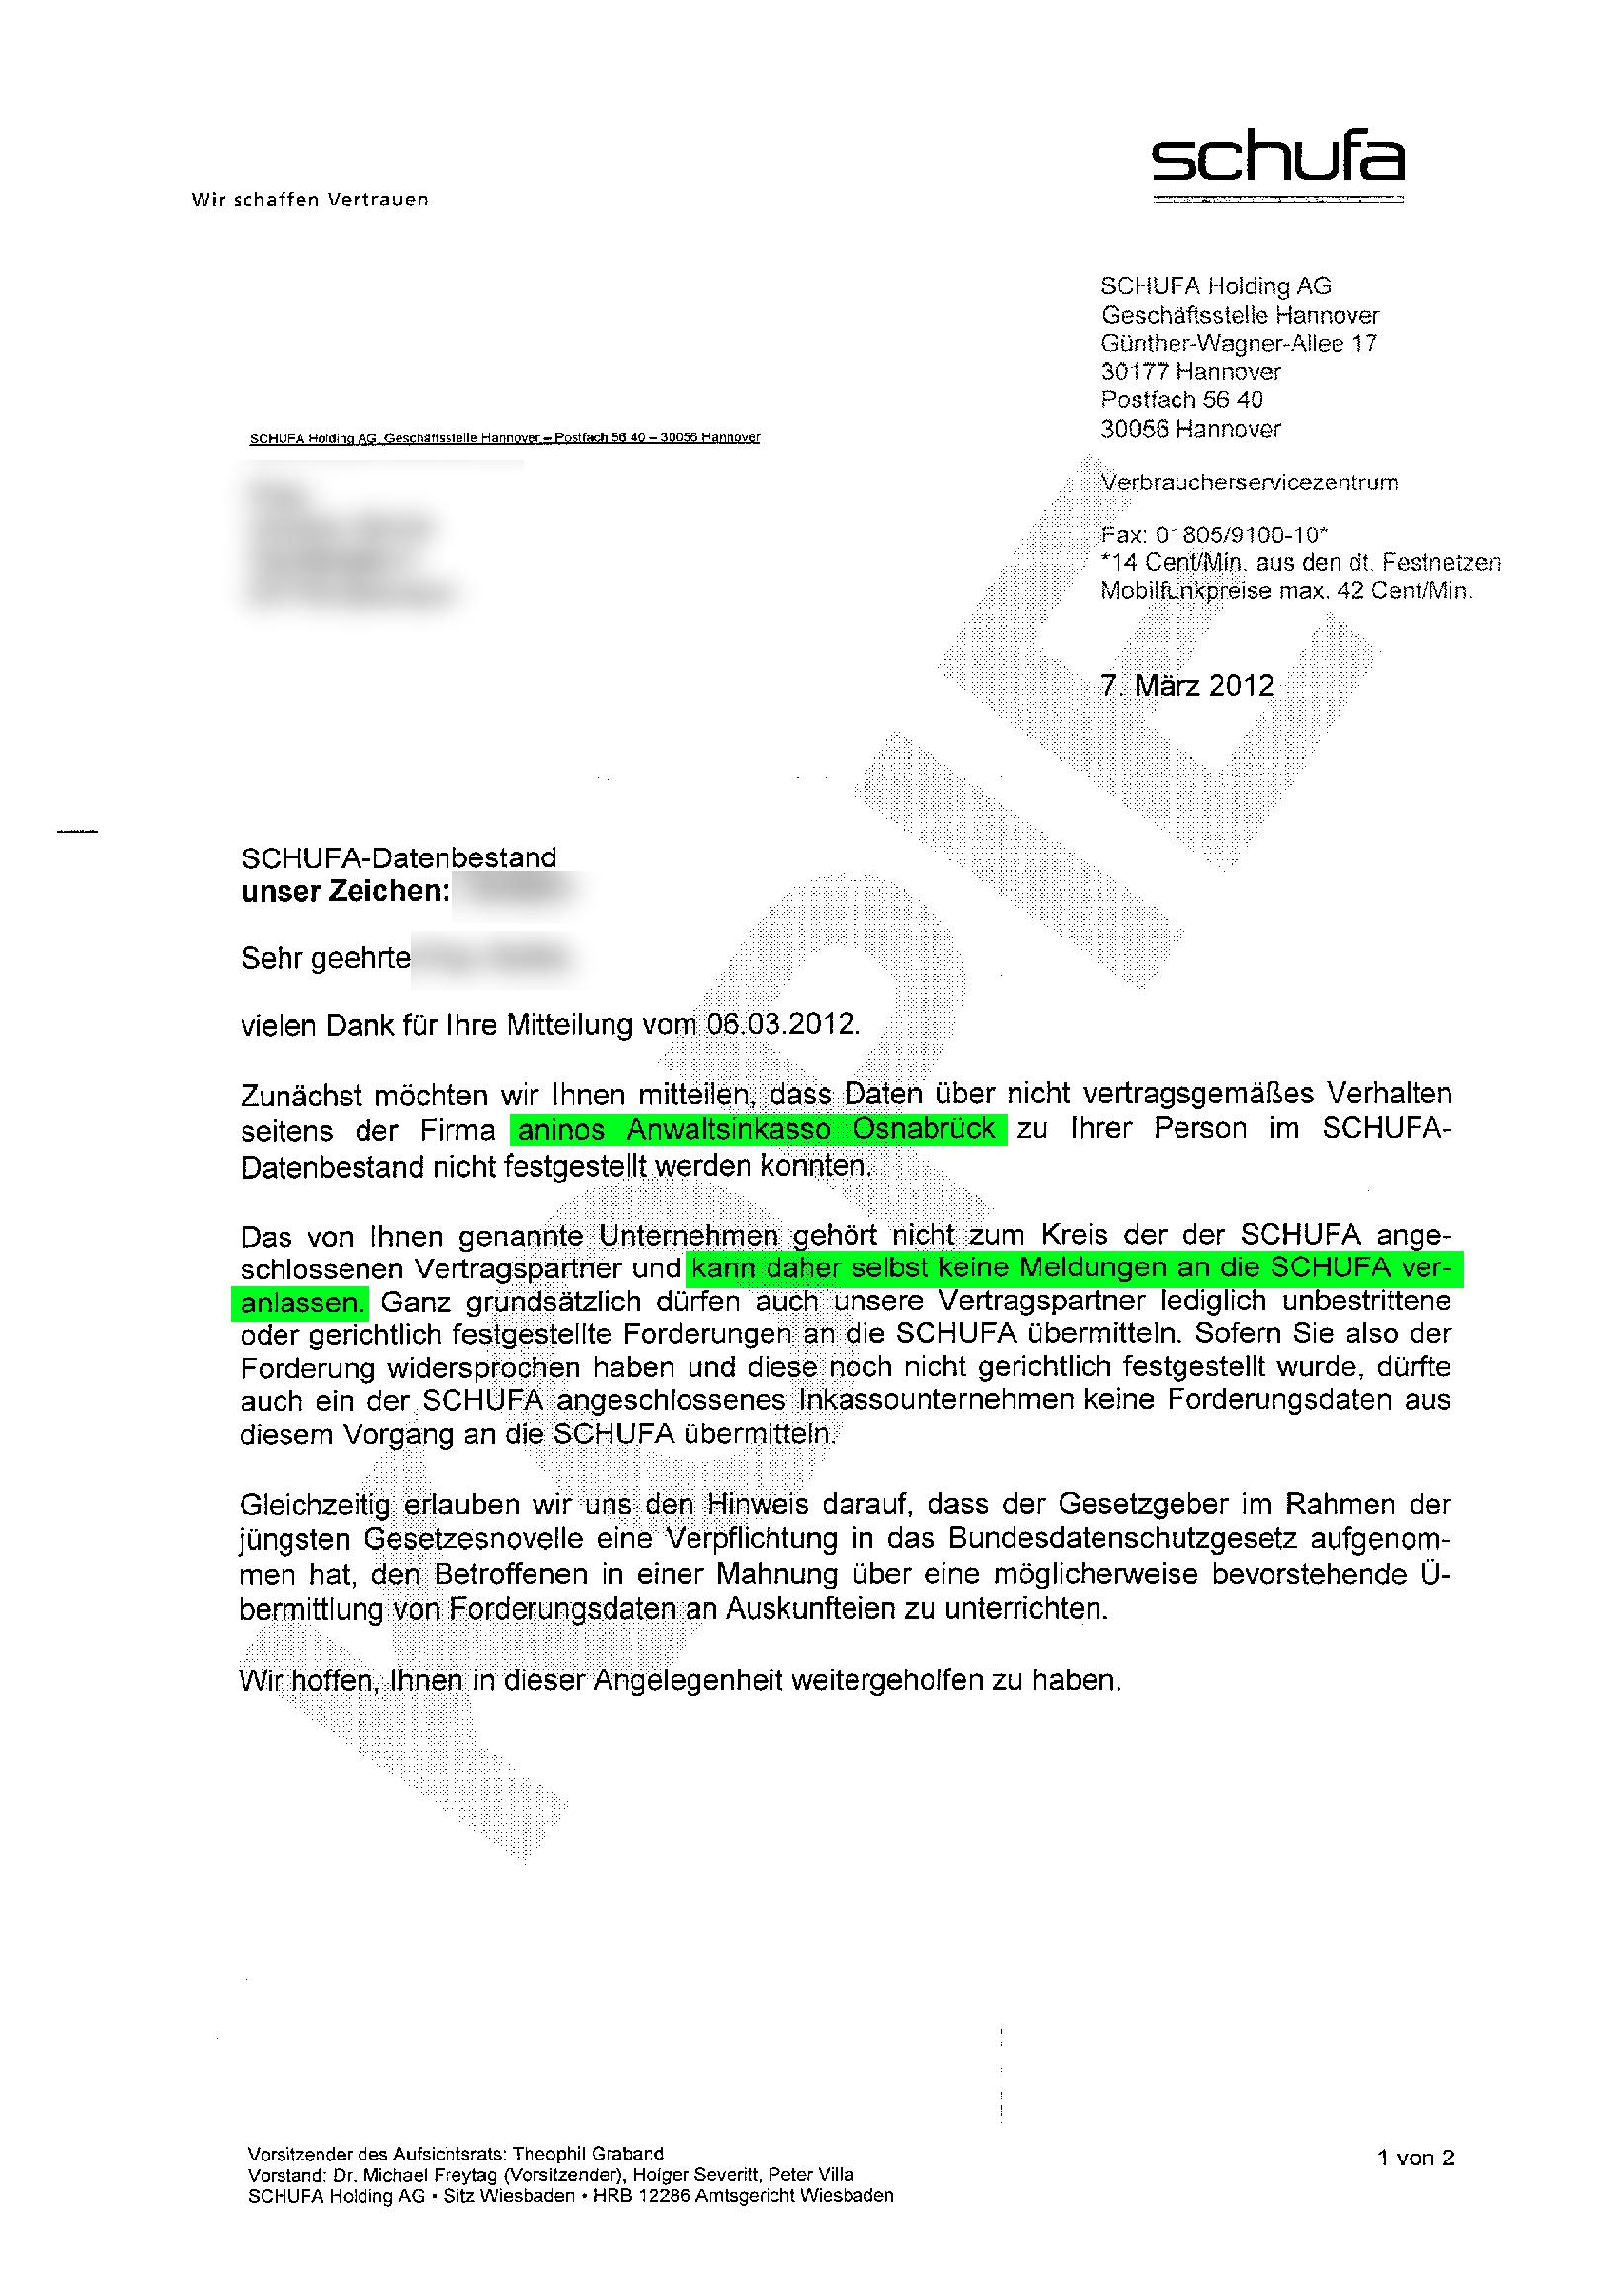 Aninos Anwaltsinkasso Ist Kein Schufa Mitglied